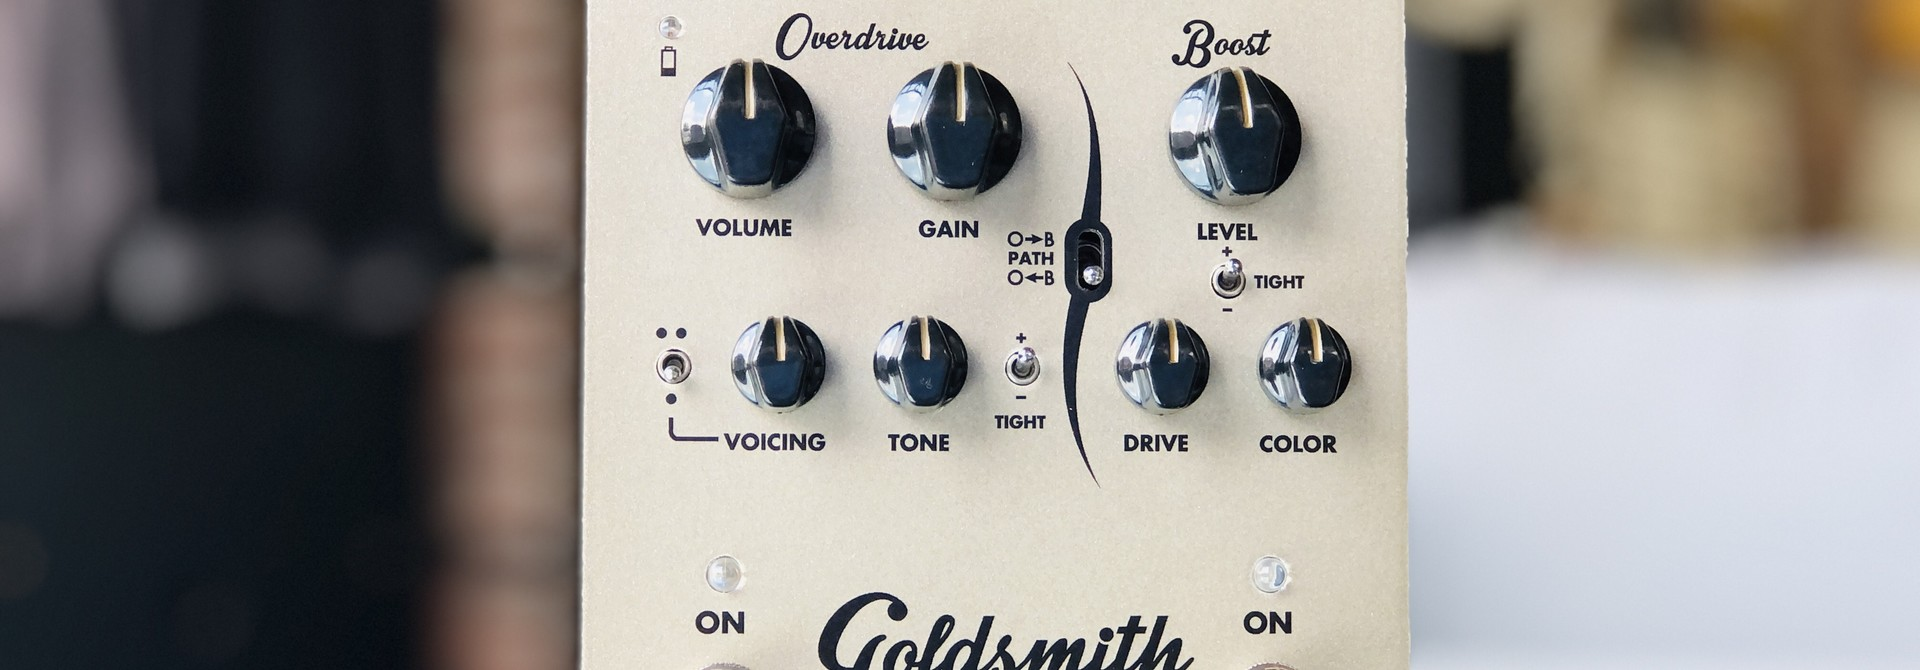 Egnater Goldsmith Overdrive Boost